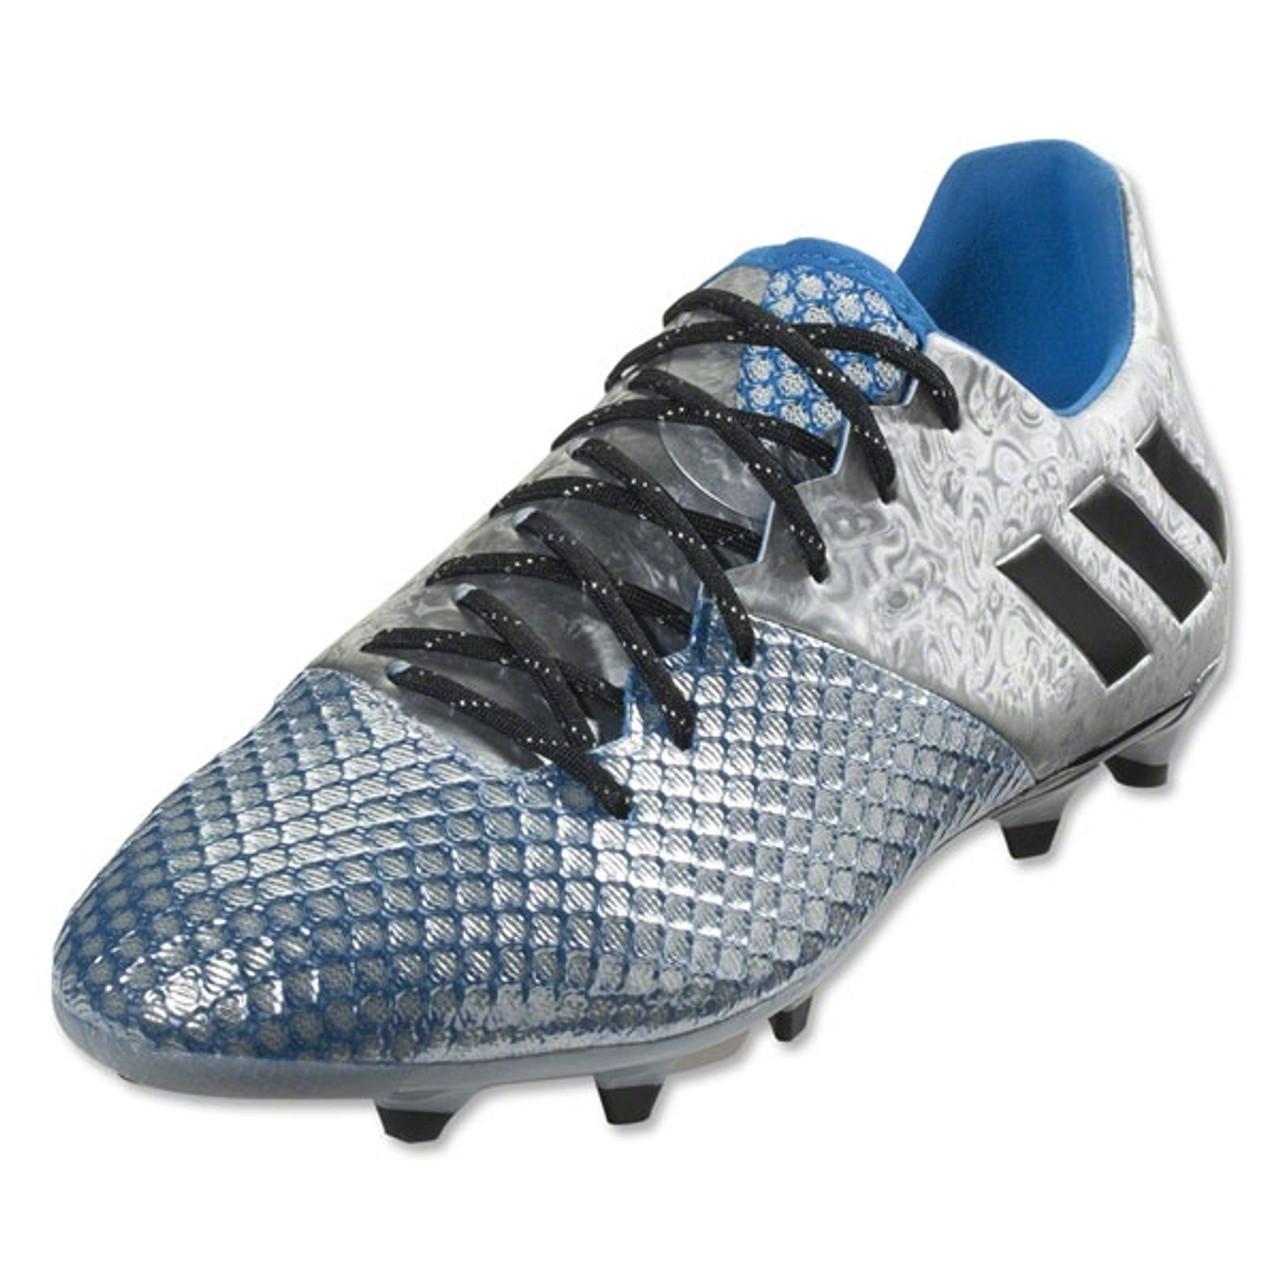 adidas Messi 16.2 FG Firm Ground Football Boots Mens Blau